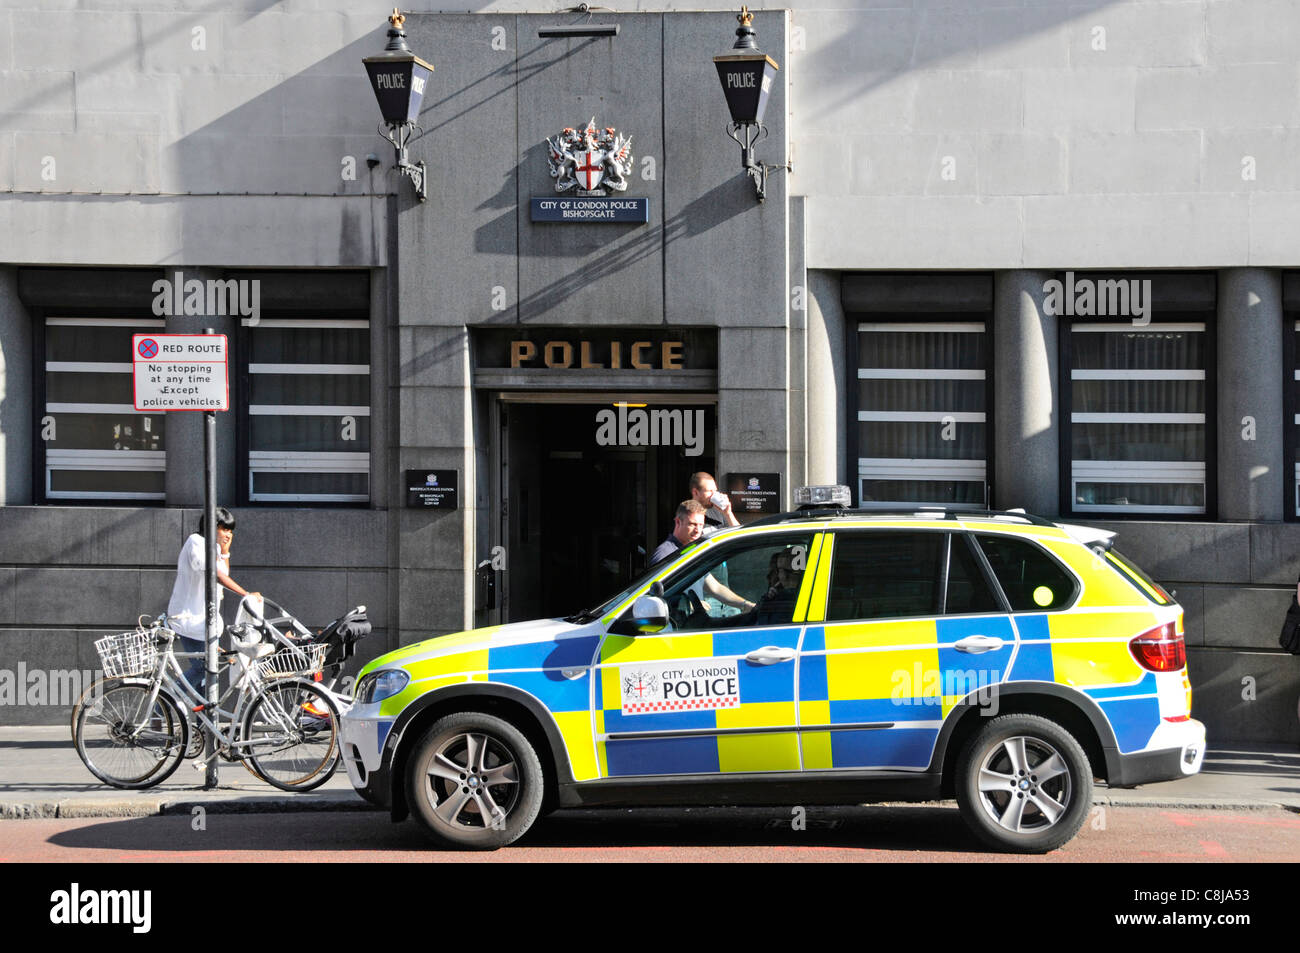 polizei auto au en eingang der city of london bishopsgate police station blaue lampen mit. Black Bedroom Furniture Sets. Home Design Ideas